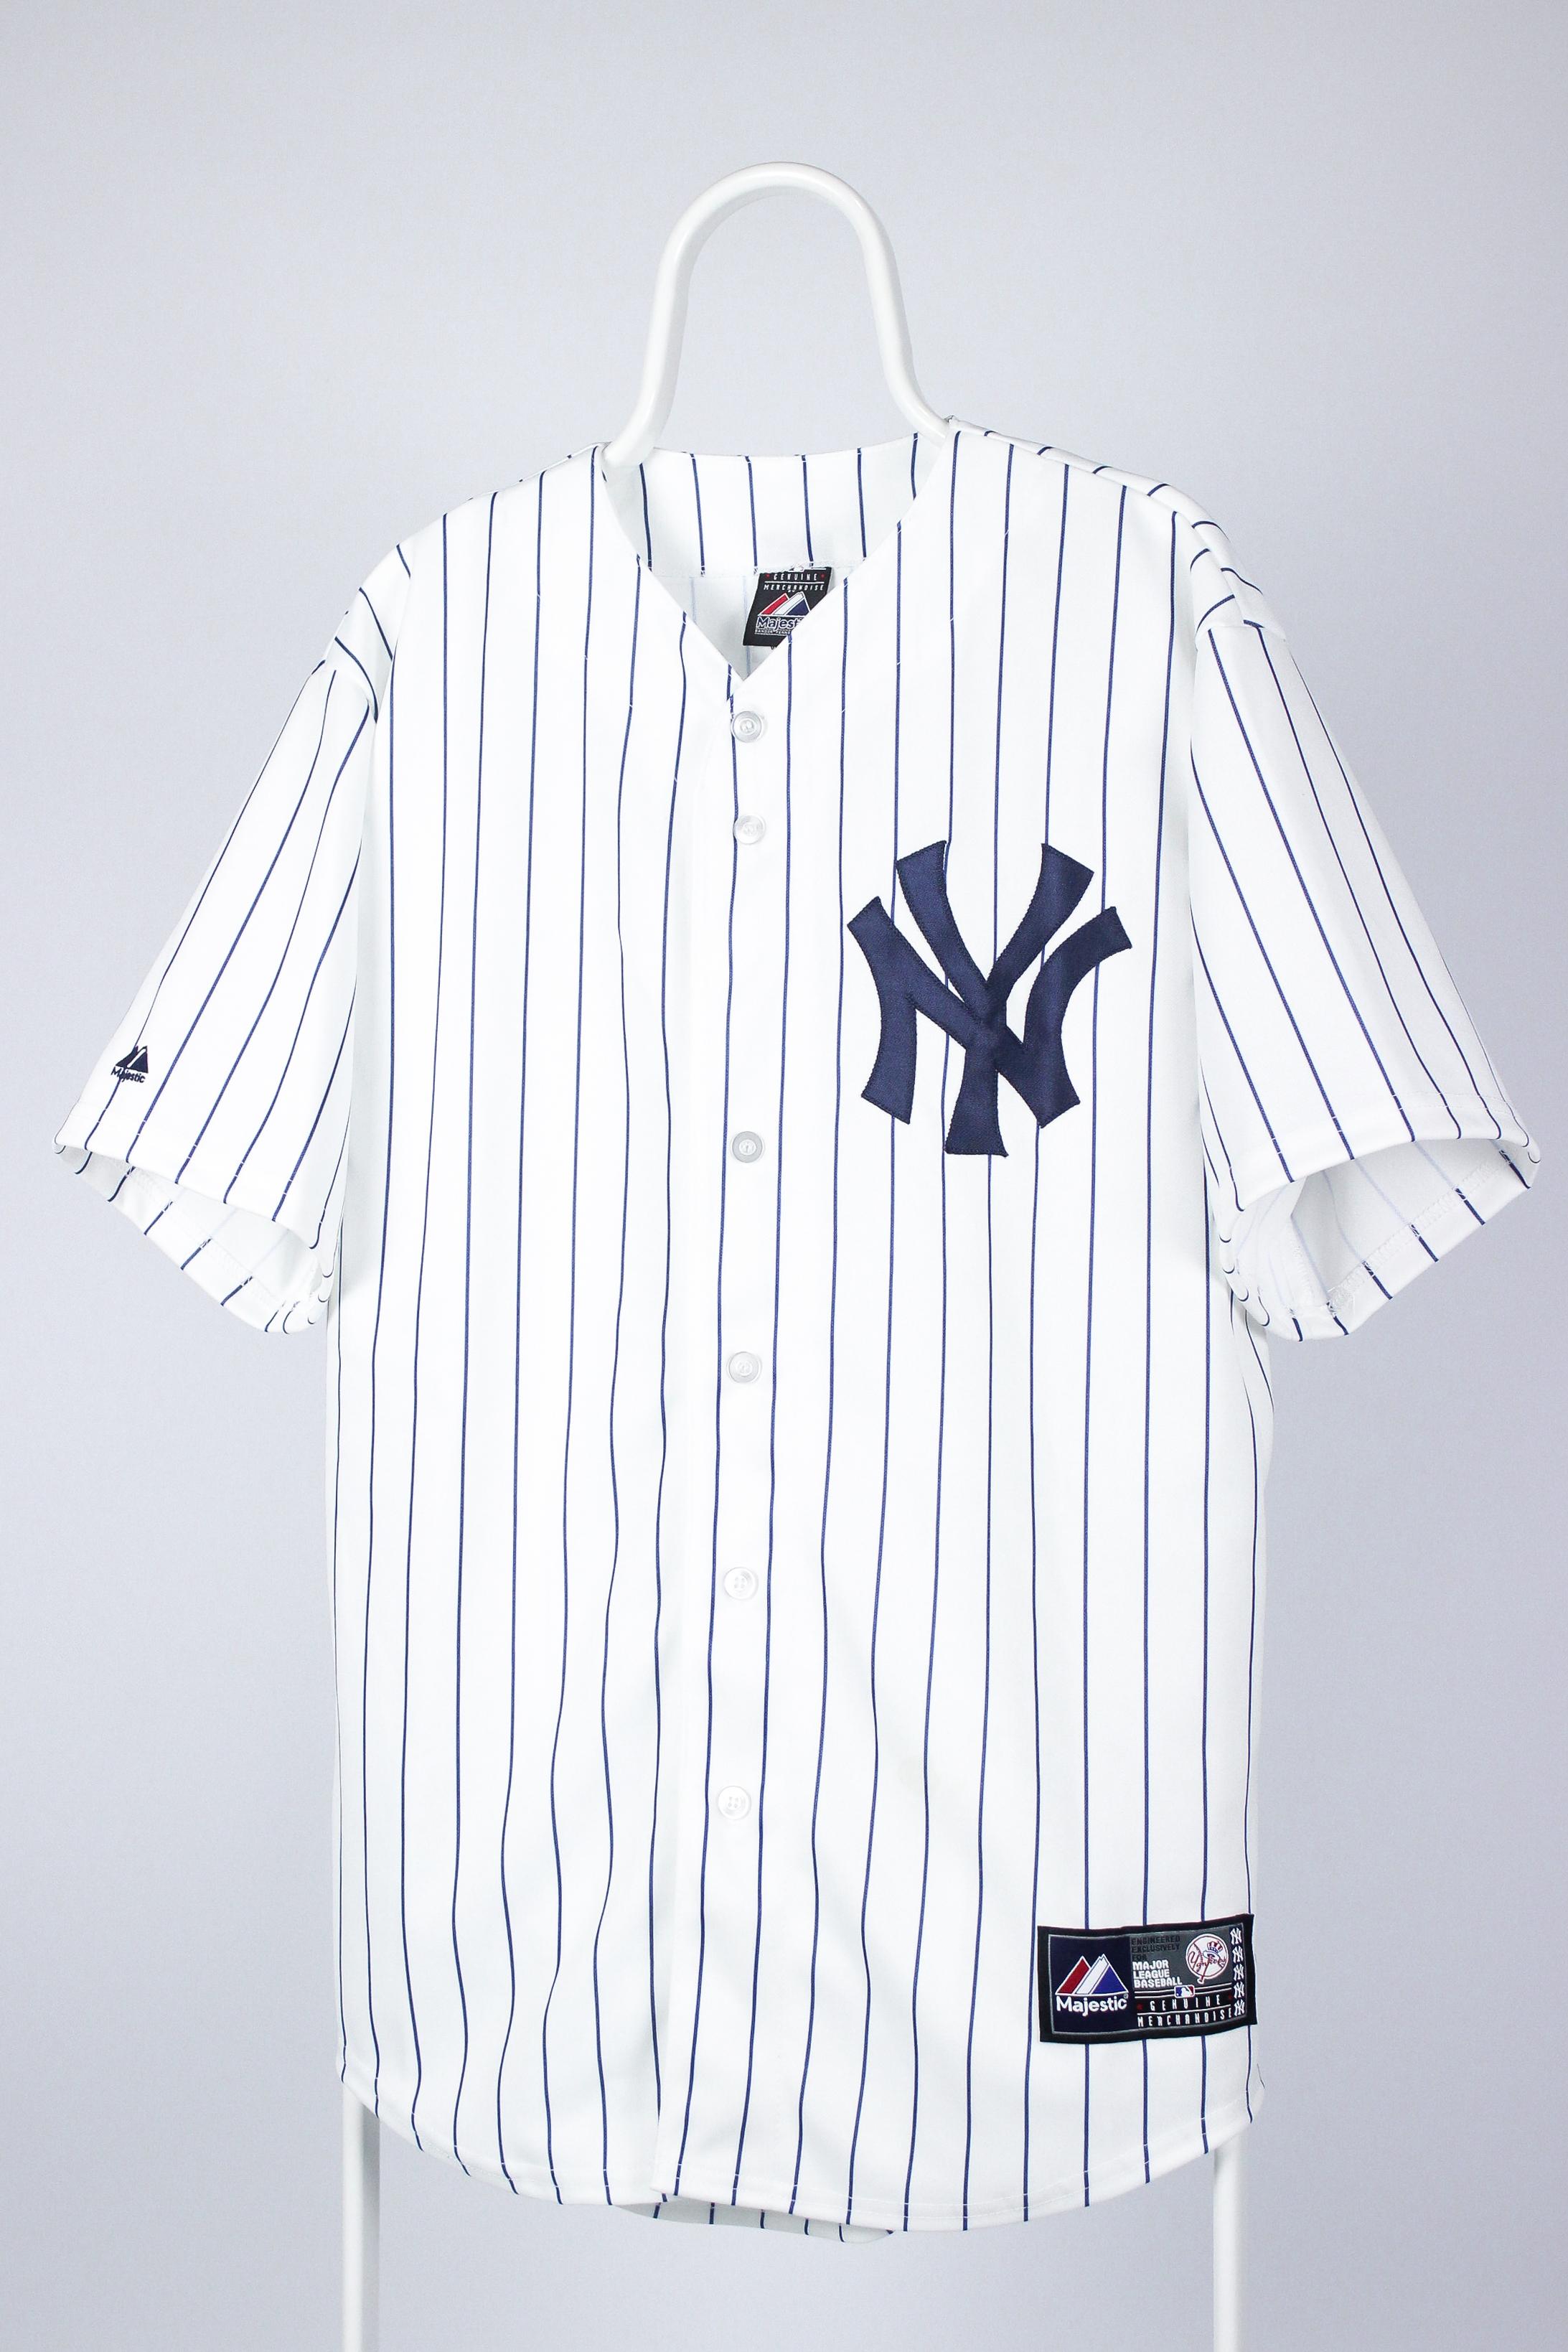 87243dd91c4 Majestic Mens MAJESTIC NY Yankees ICHIRO SUZUKI Baseball Jersey Shirt Size l  - Jerseys for Sale - Grailed